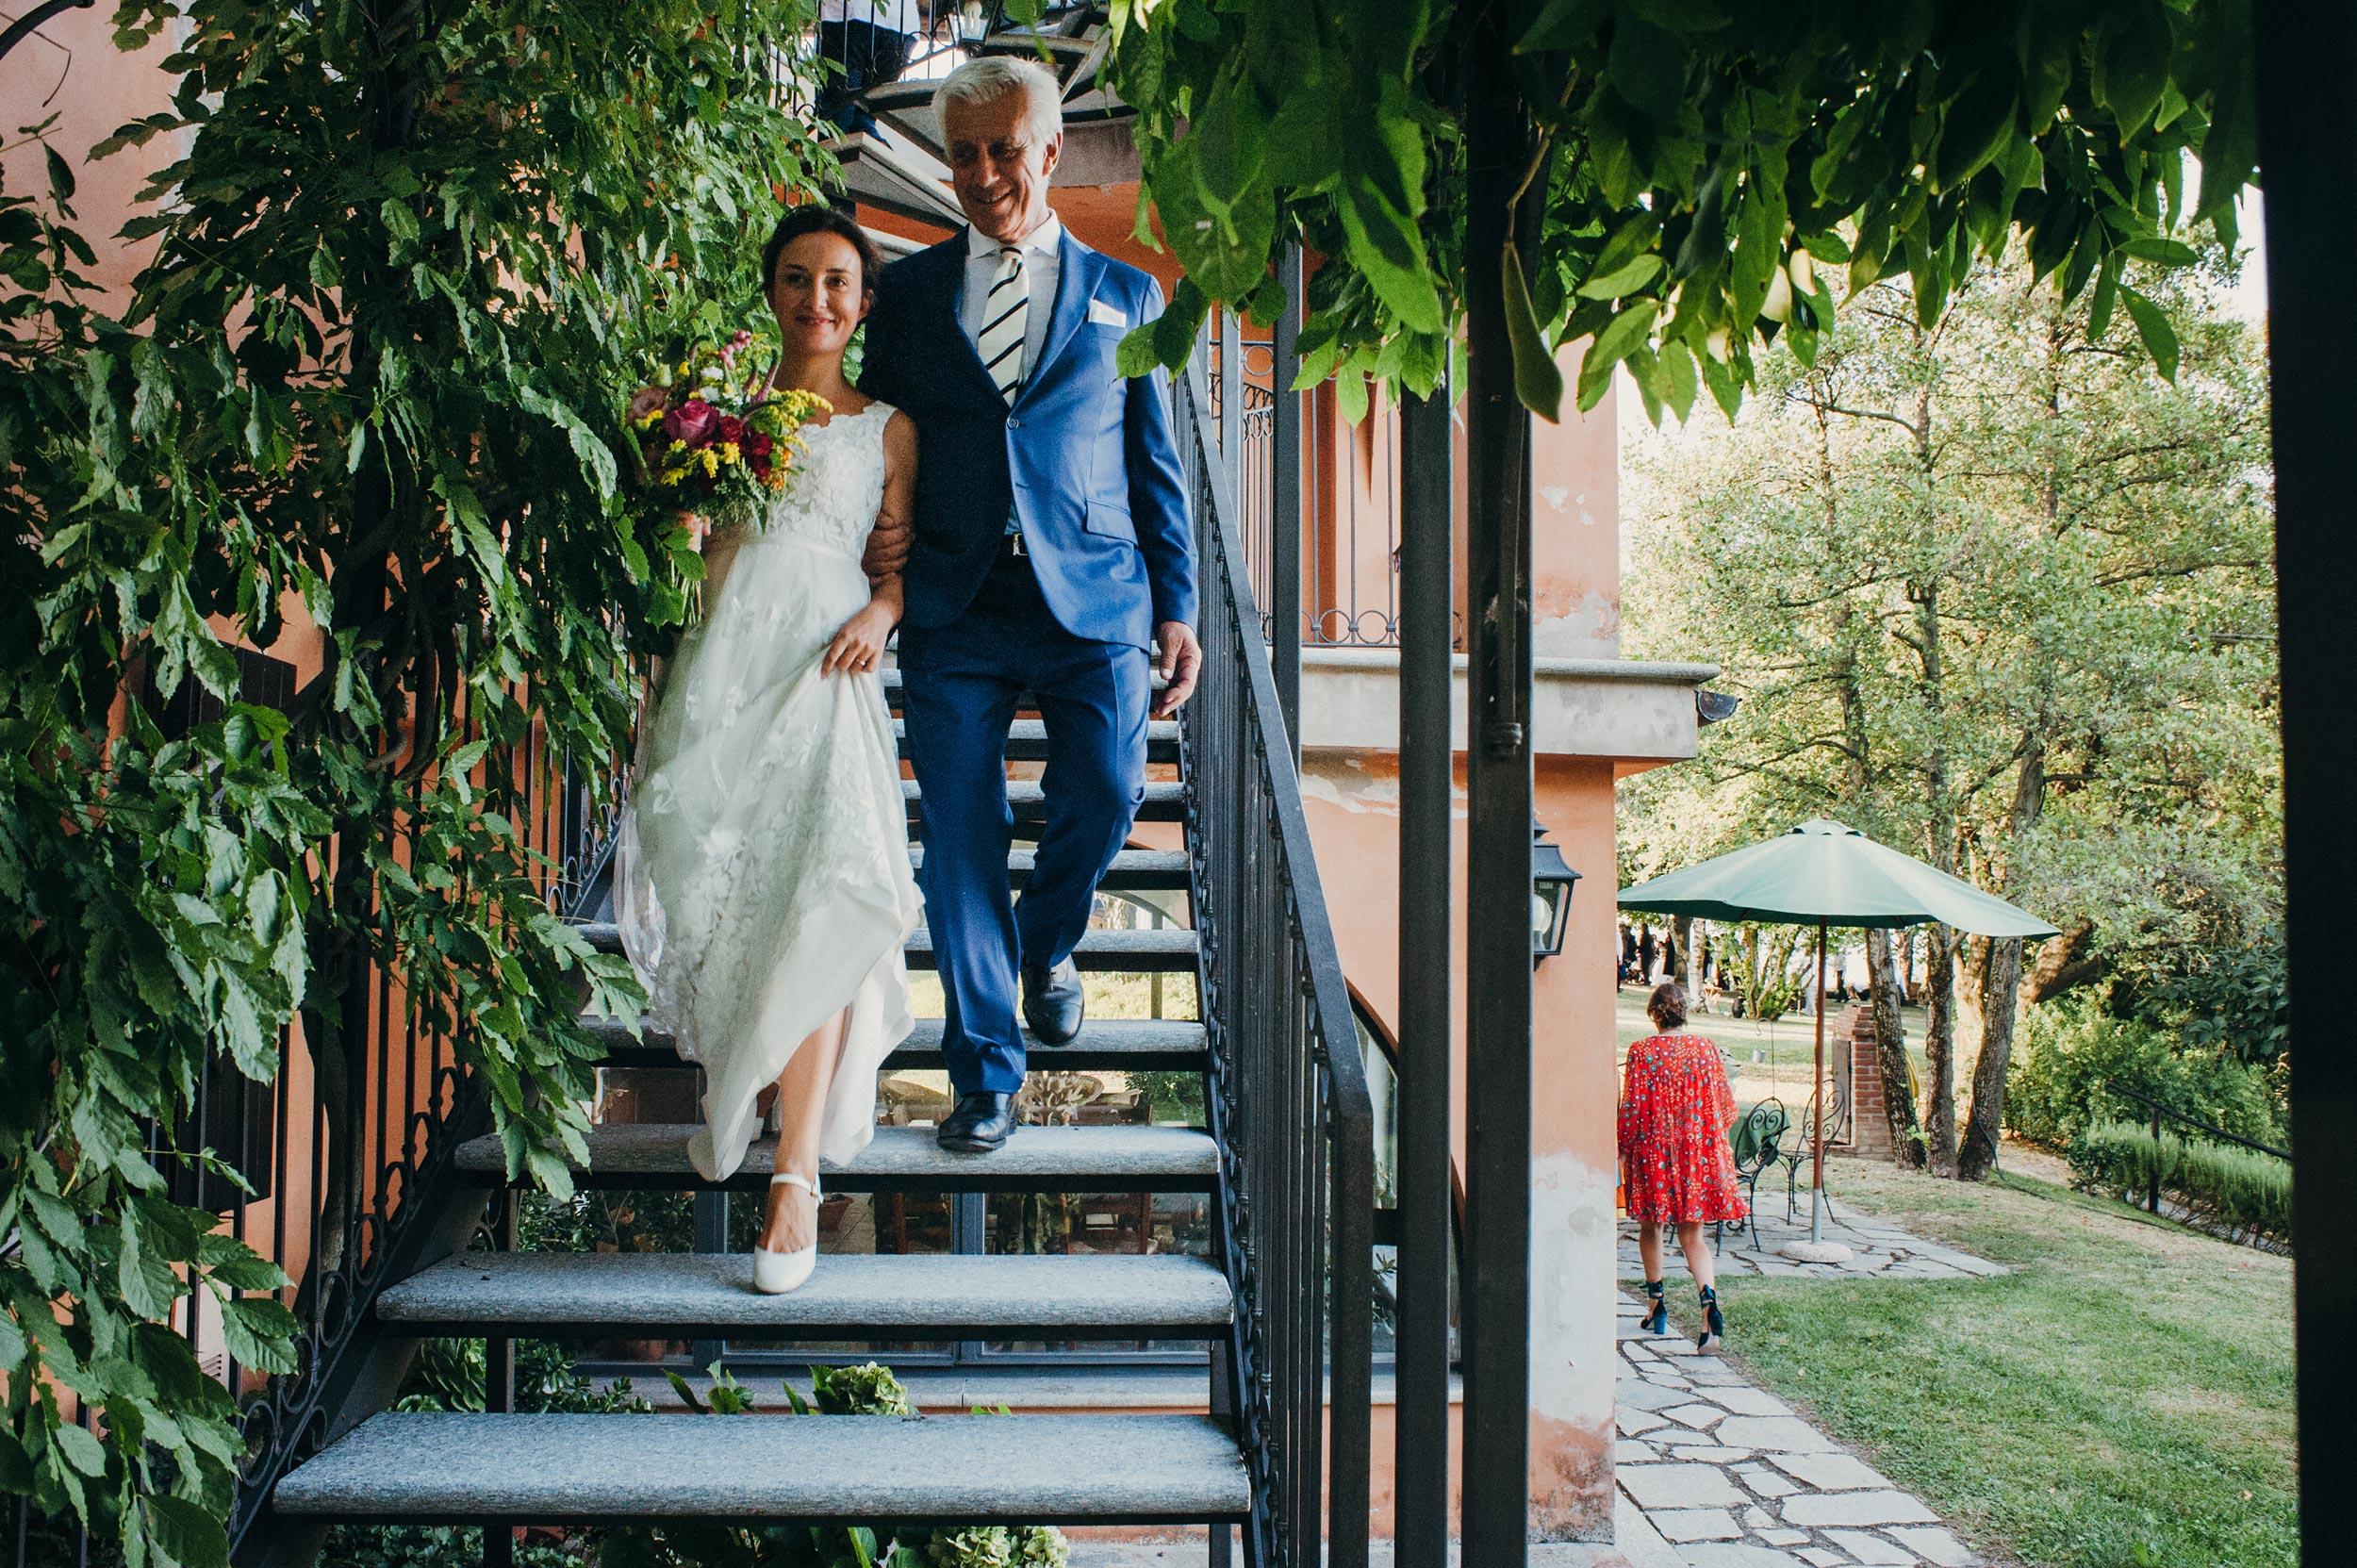 2016-Davor-Chiara-Monferrato-Asti-Vercelli-Wedding-Photographer-Italy-Alessandro-Avenali-26.jpg